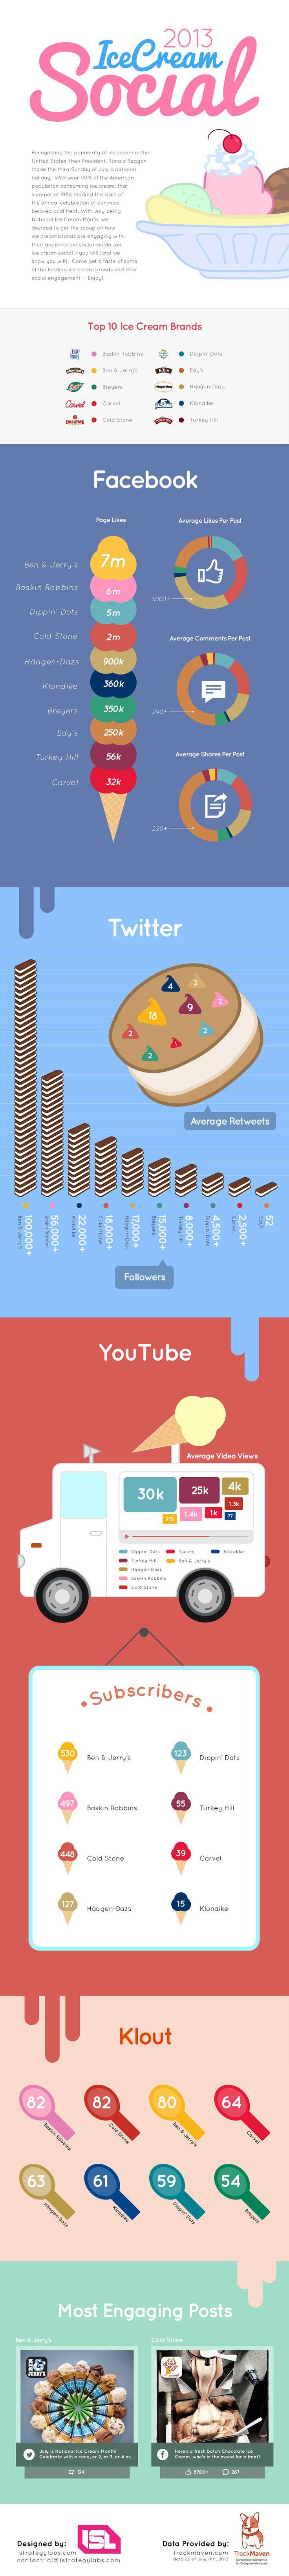 10 Best Ice Cream Brands According To Social Media #infographic